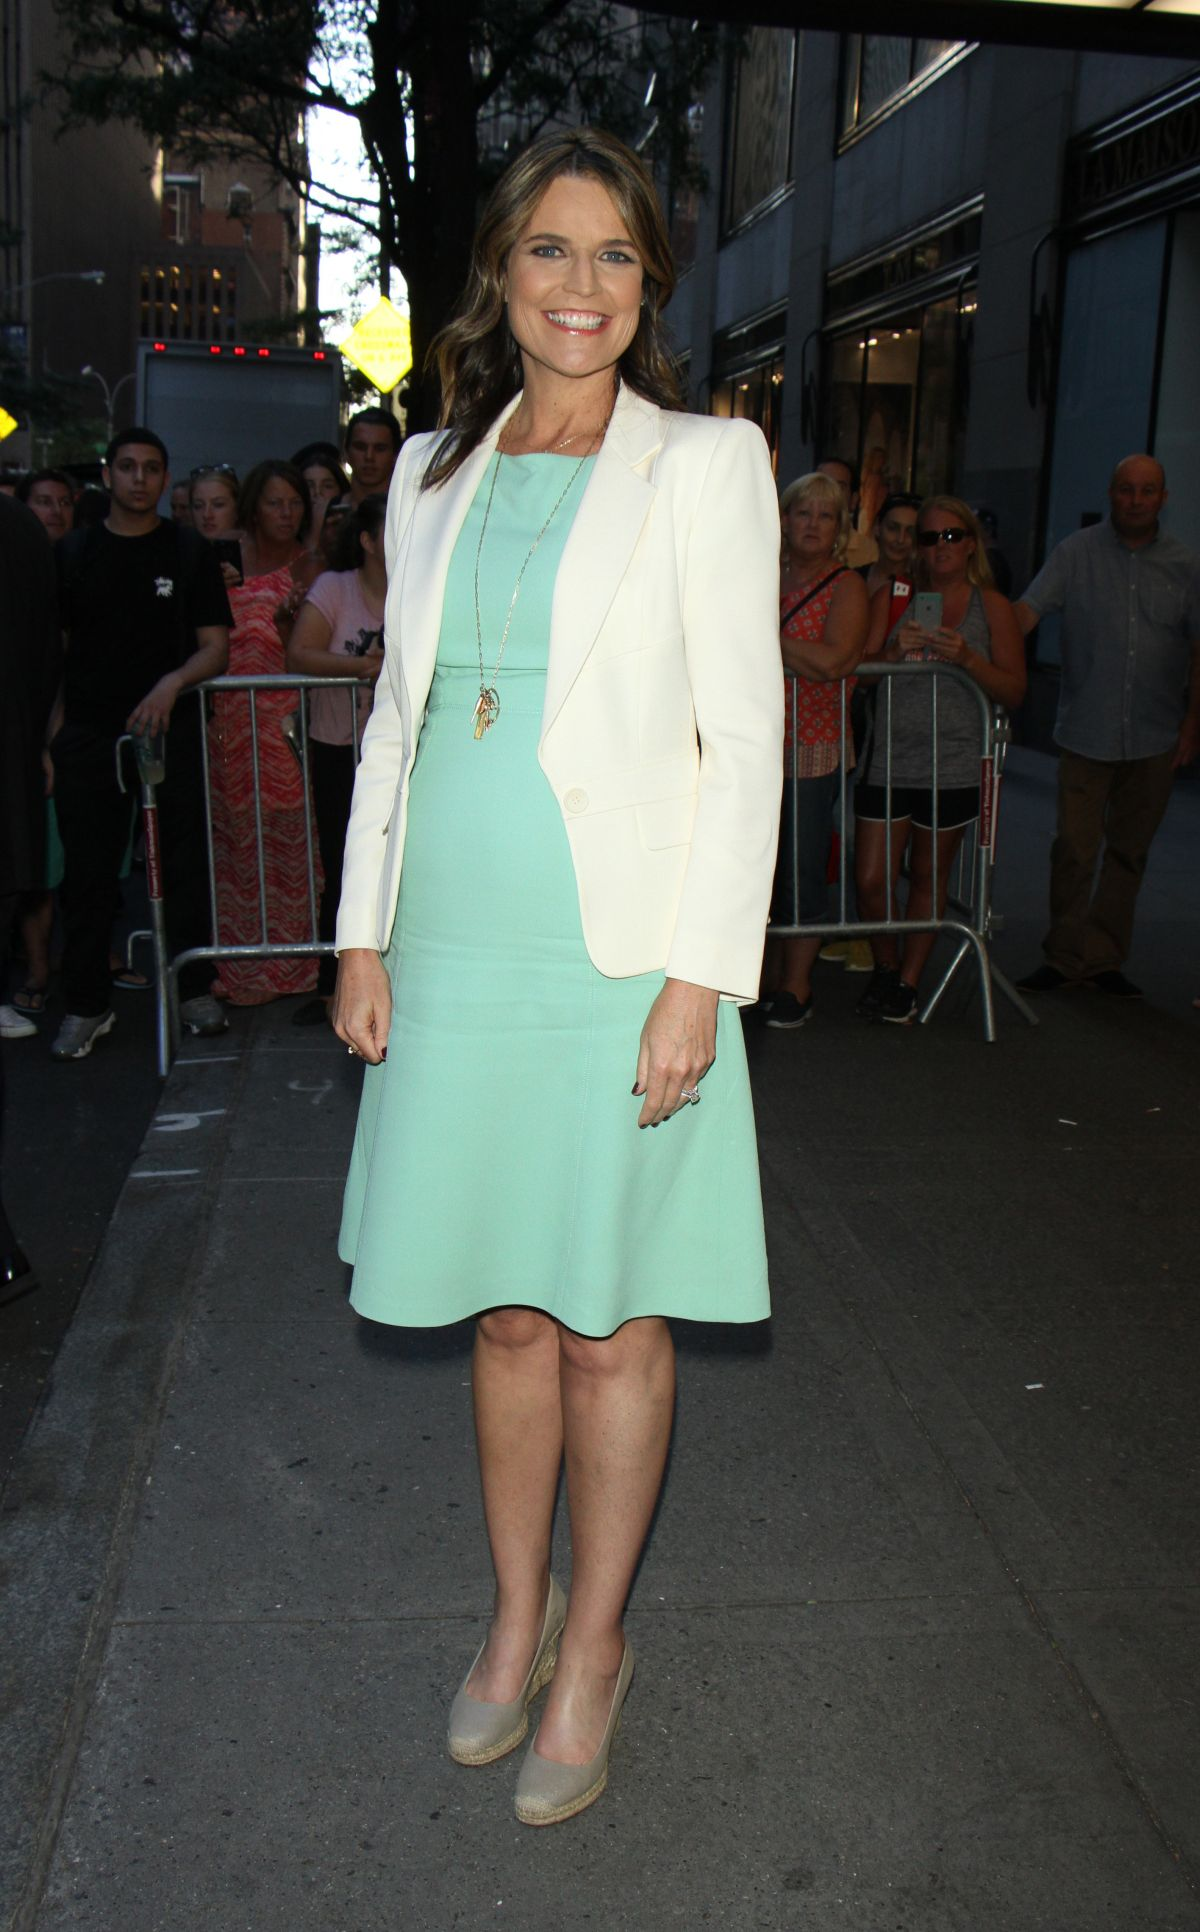 SAVANNAH GUTHRIE at NBC Studios in New York 08/03/2016